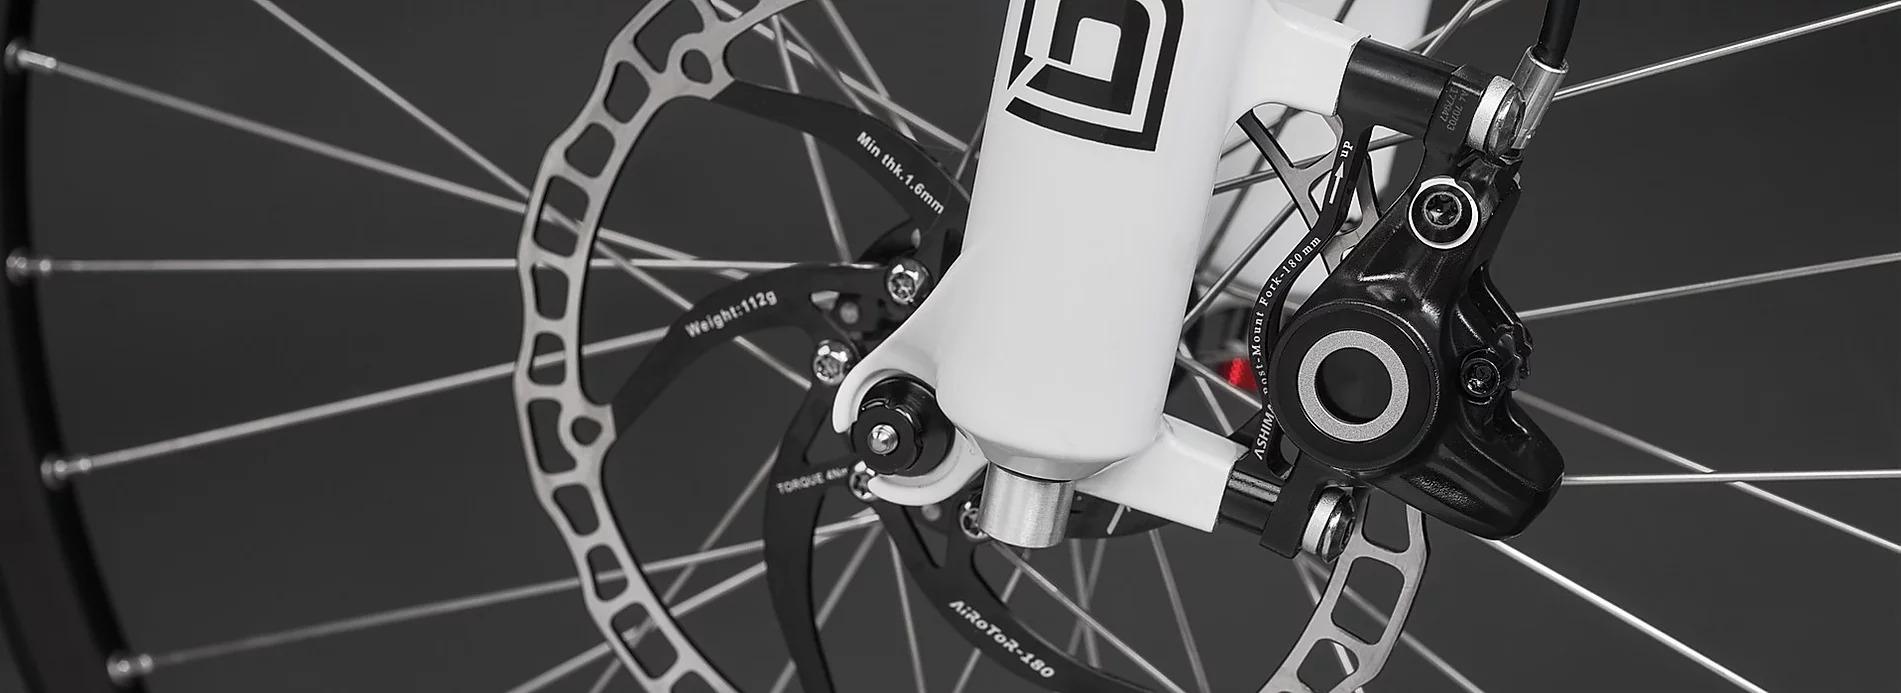 Bremsscheibe an einem Ben-E-Bike Kinderrad - Jugendrad